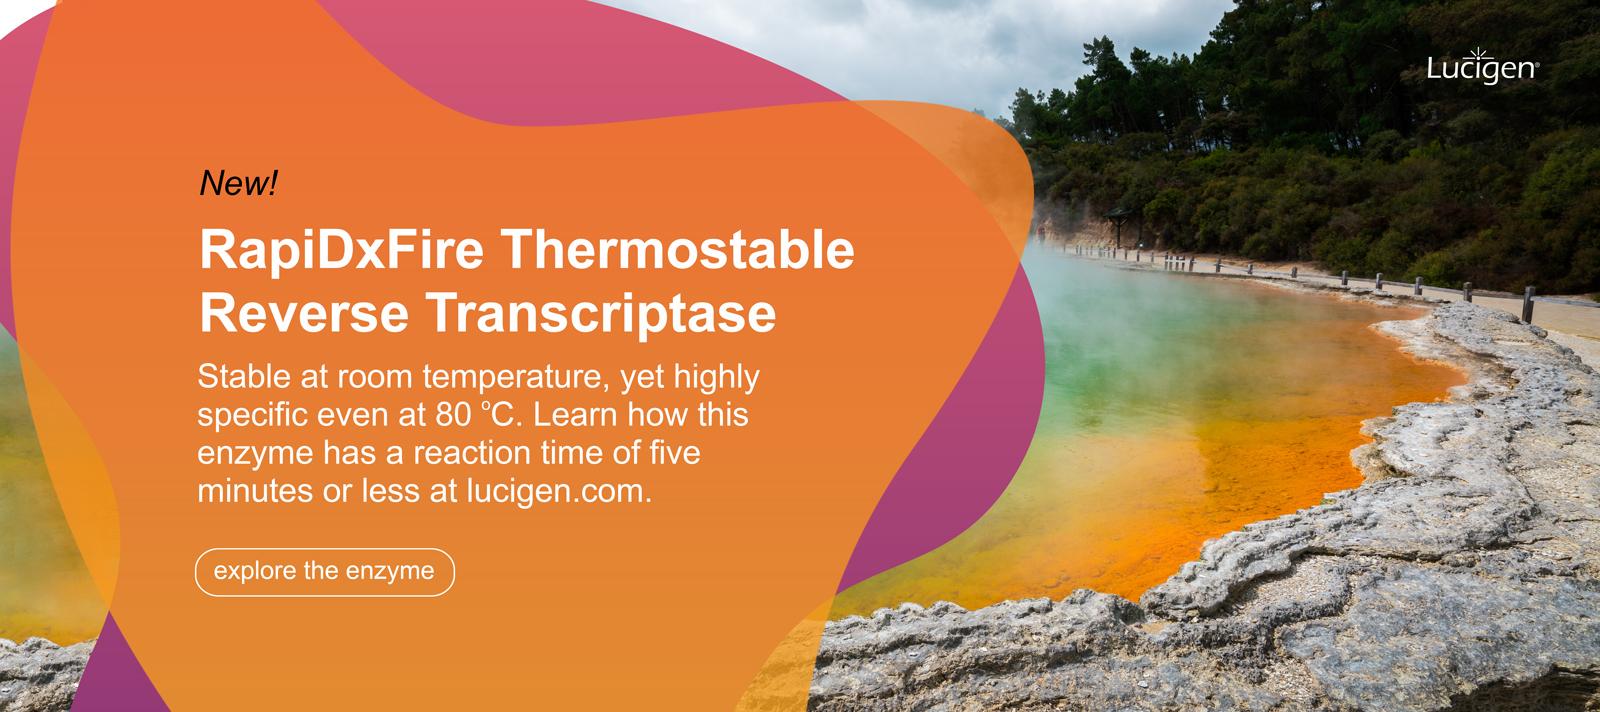 banner-rapidxfire-thermostable-reverse-transcriptase.jpg